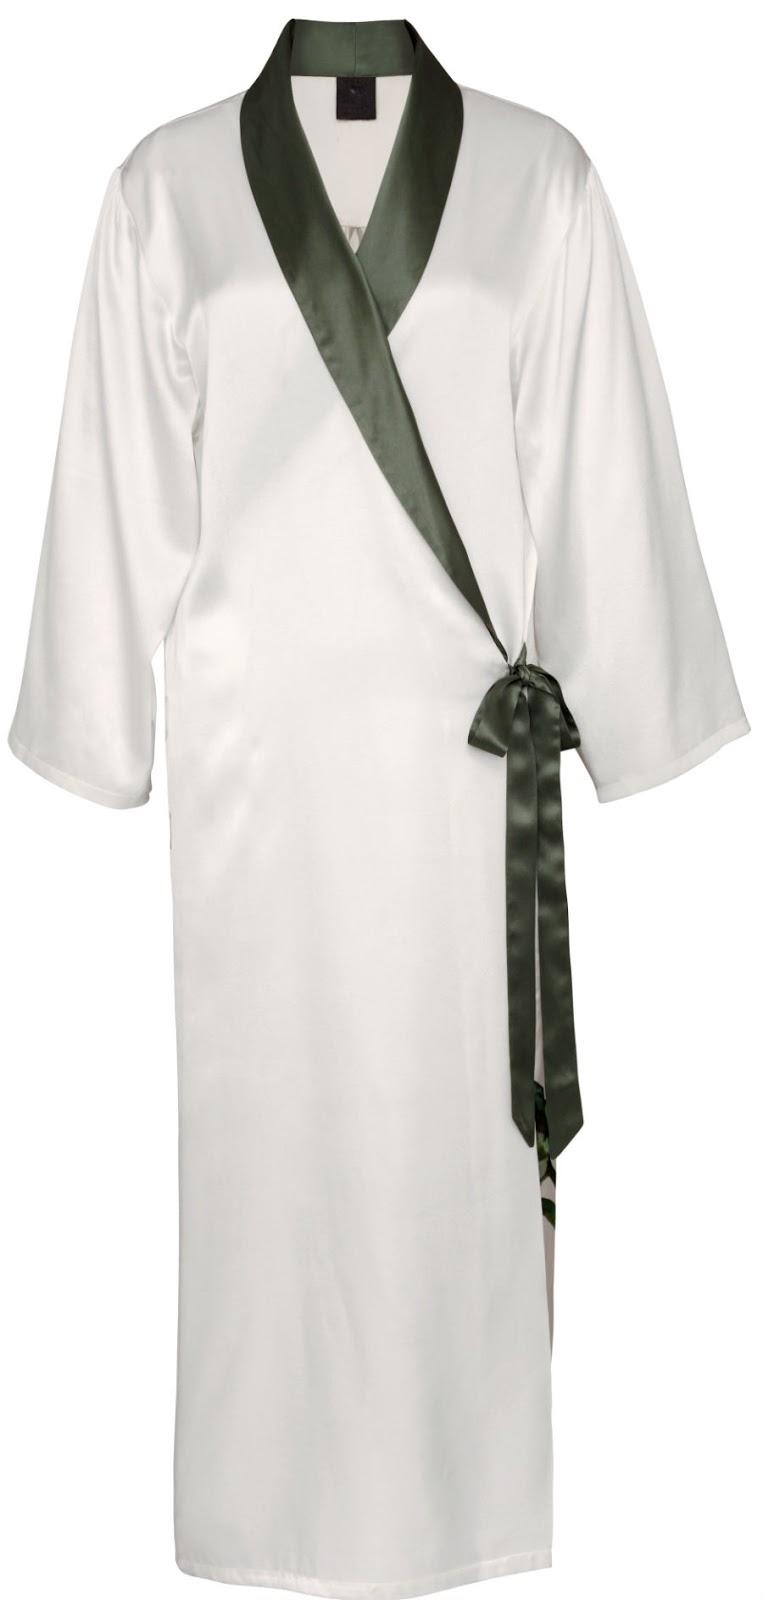 Hovey Design for kumi kookoon silk robe